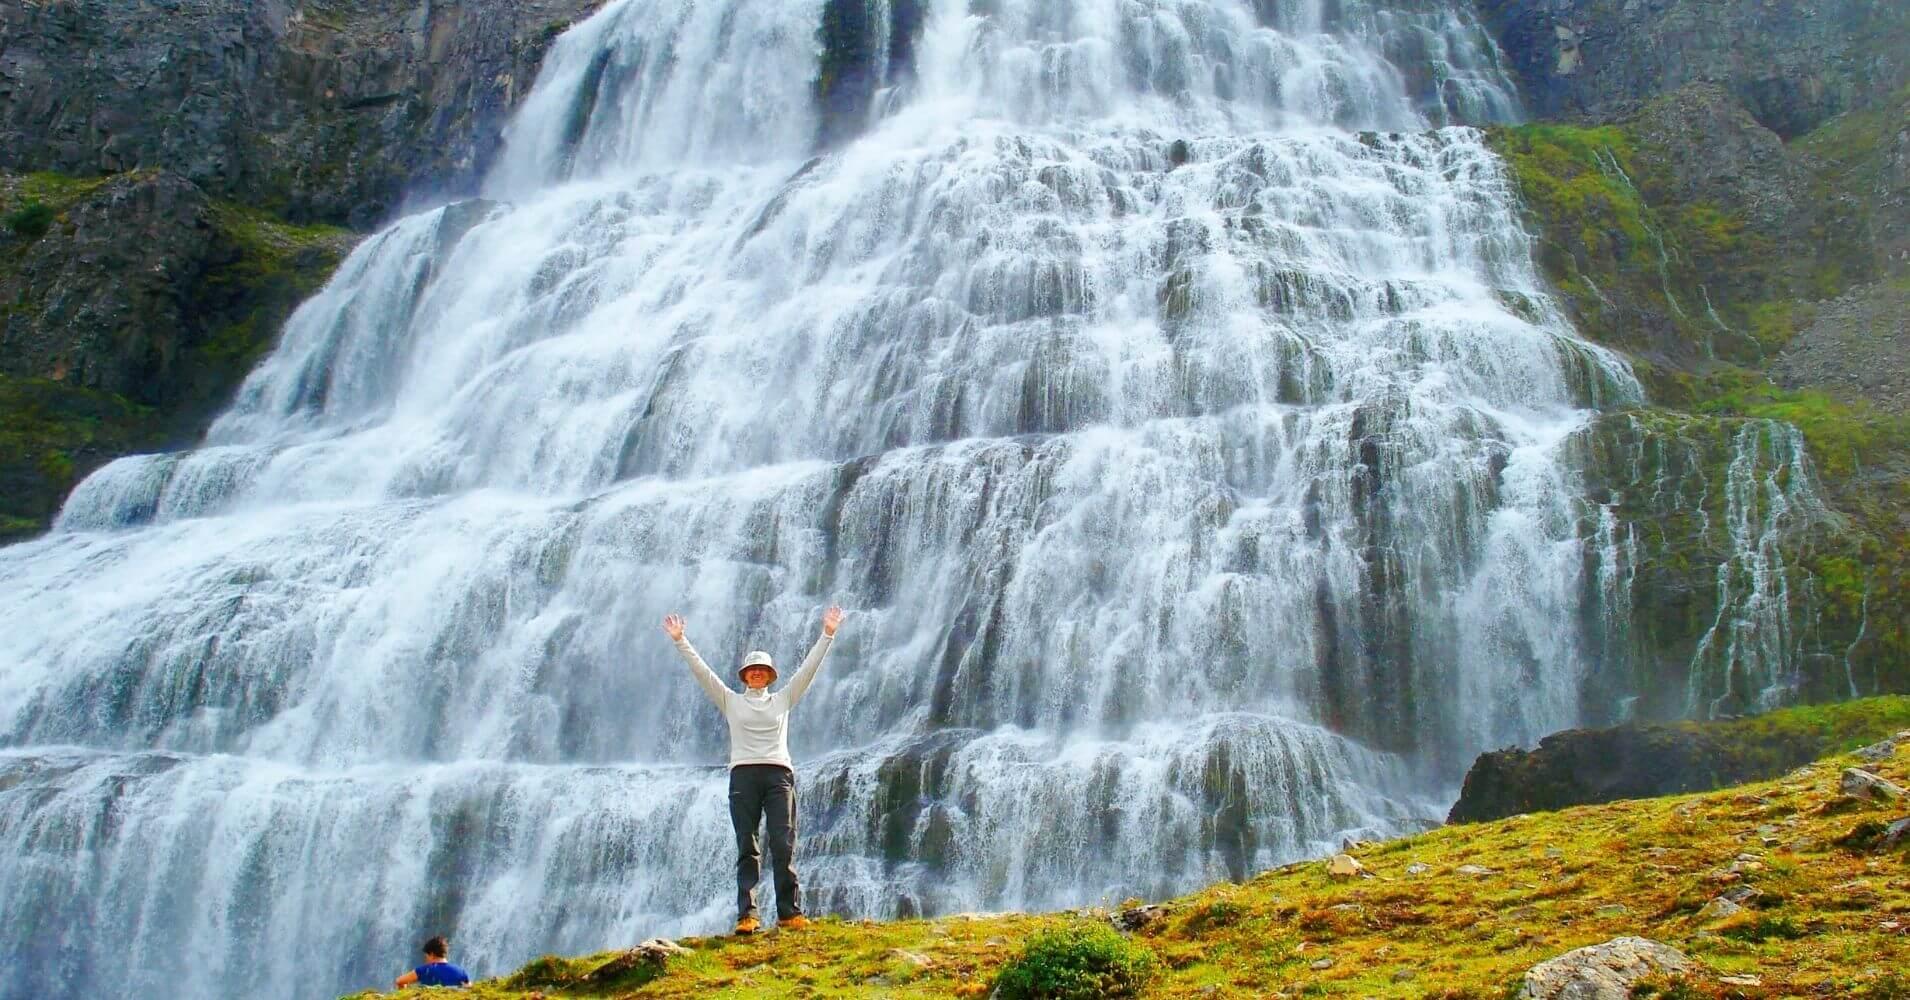 Cascada de Dynjandifoss. Fiordos del Oeste. Ísafjörður. Vestfirðir. Islandia.